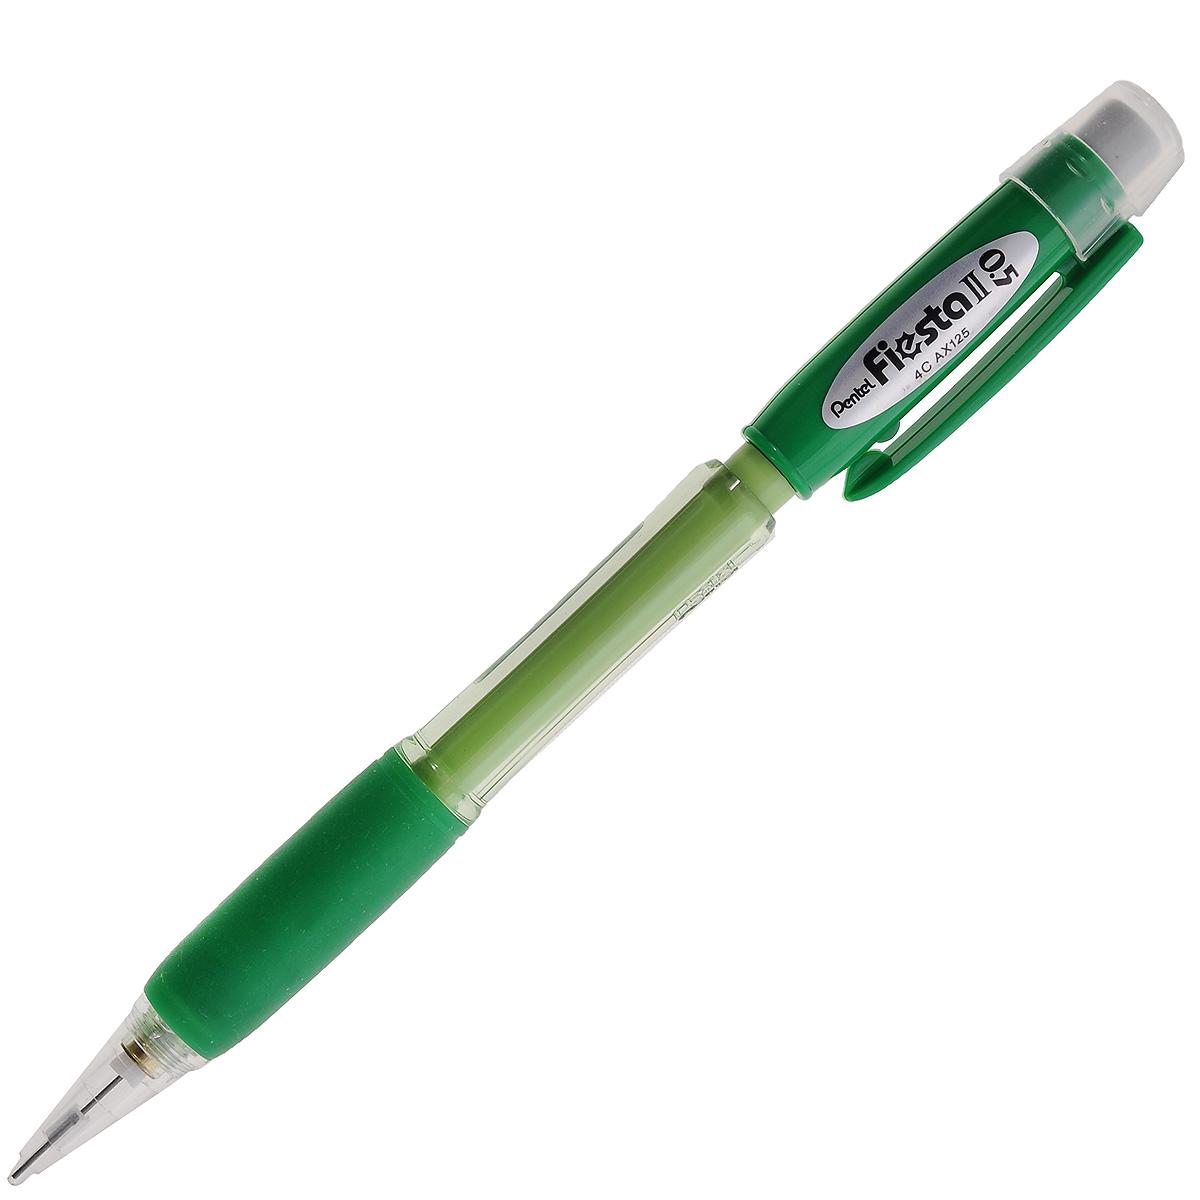 "Карандаш автоматический Pentel ""Fiesta II"", цвет корпуса: зеленый. PAX125-D"